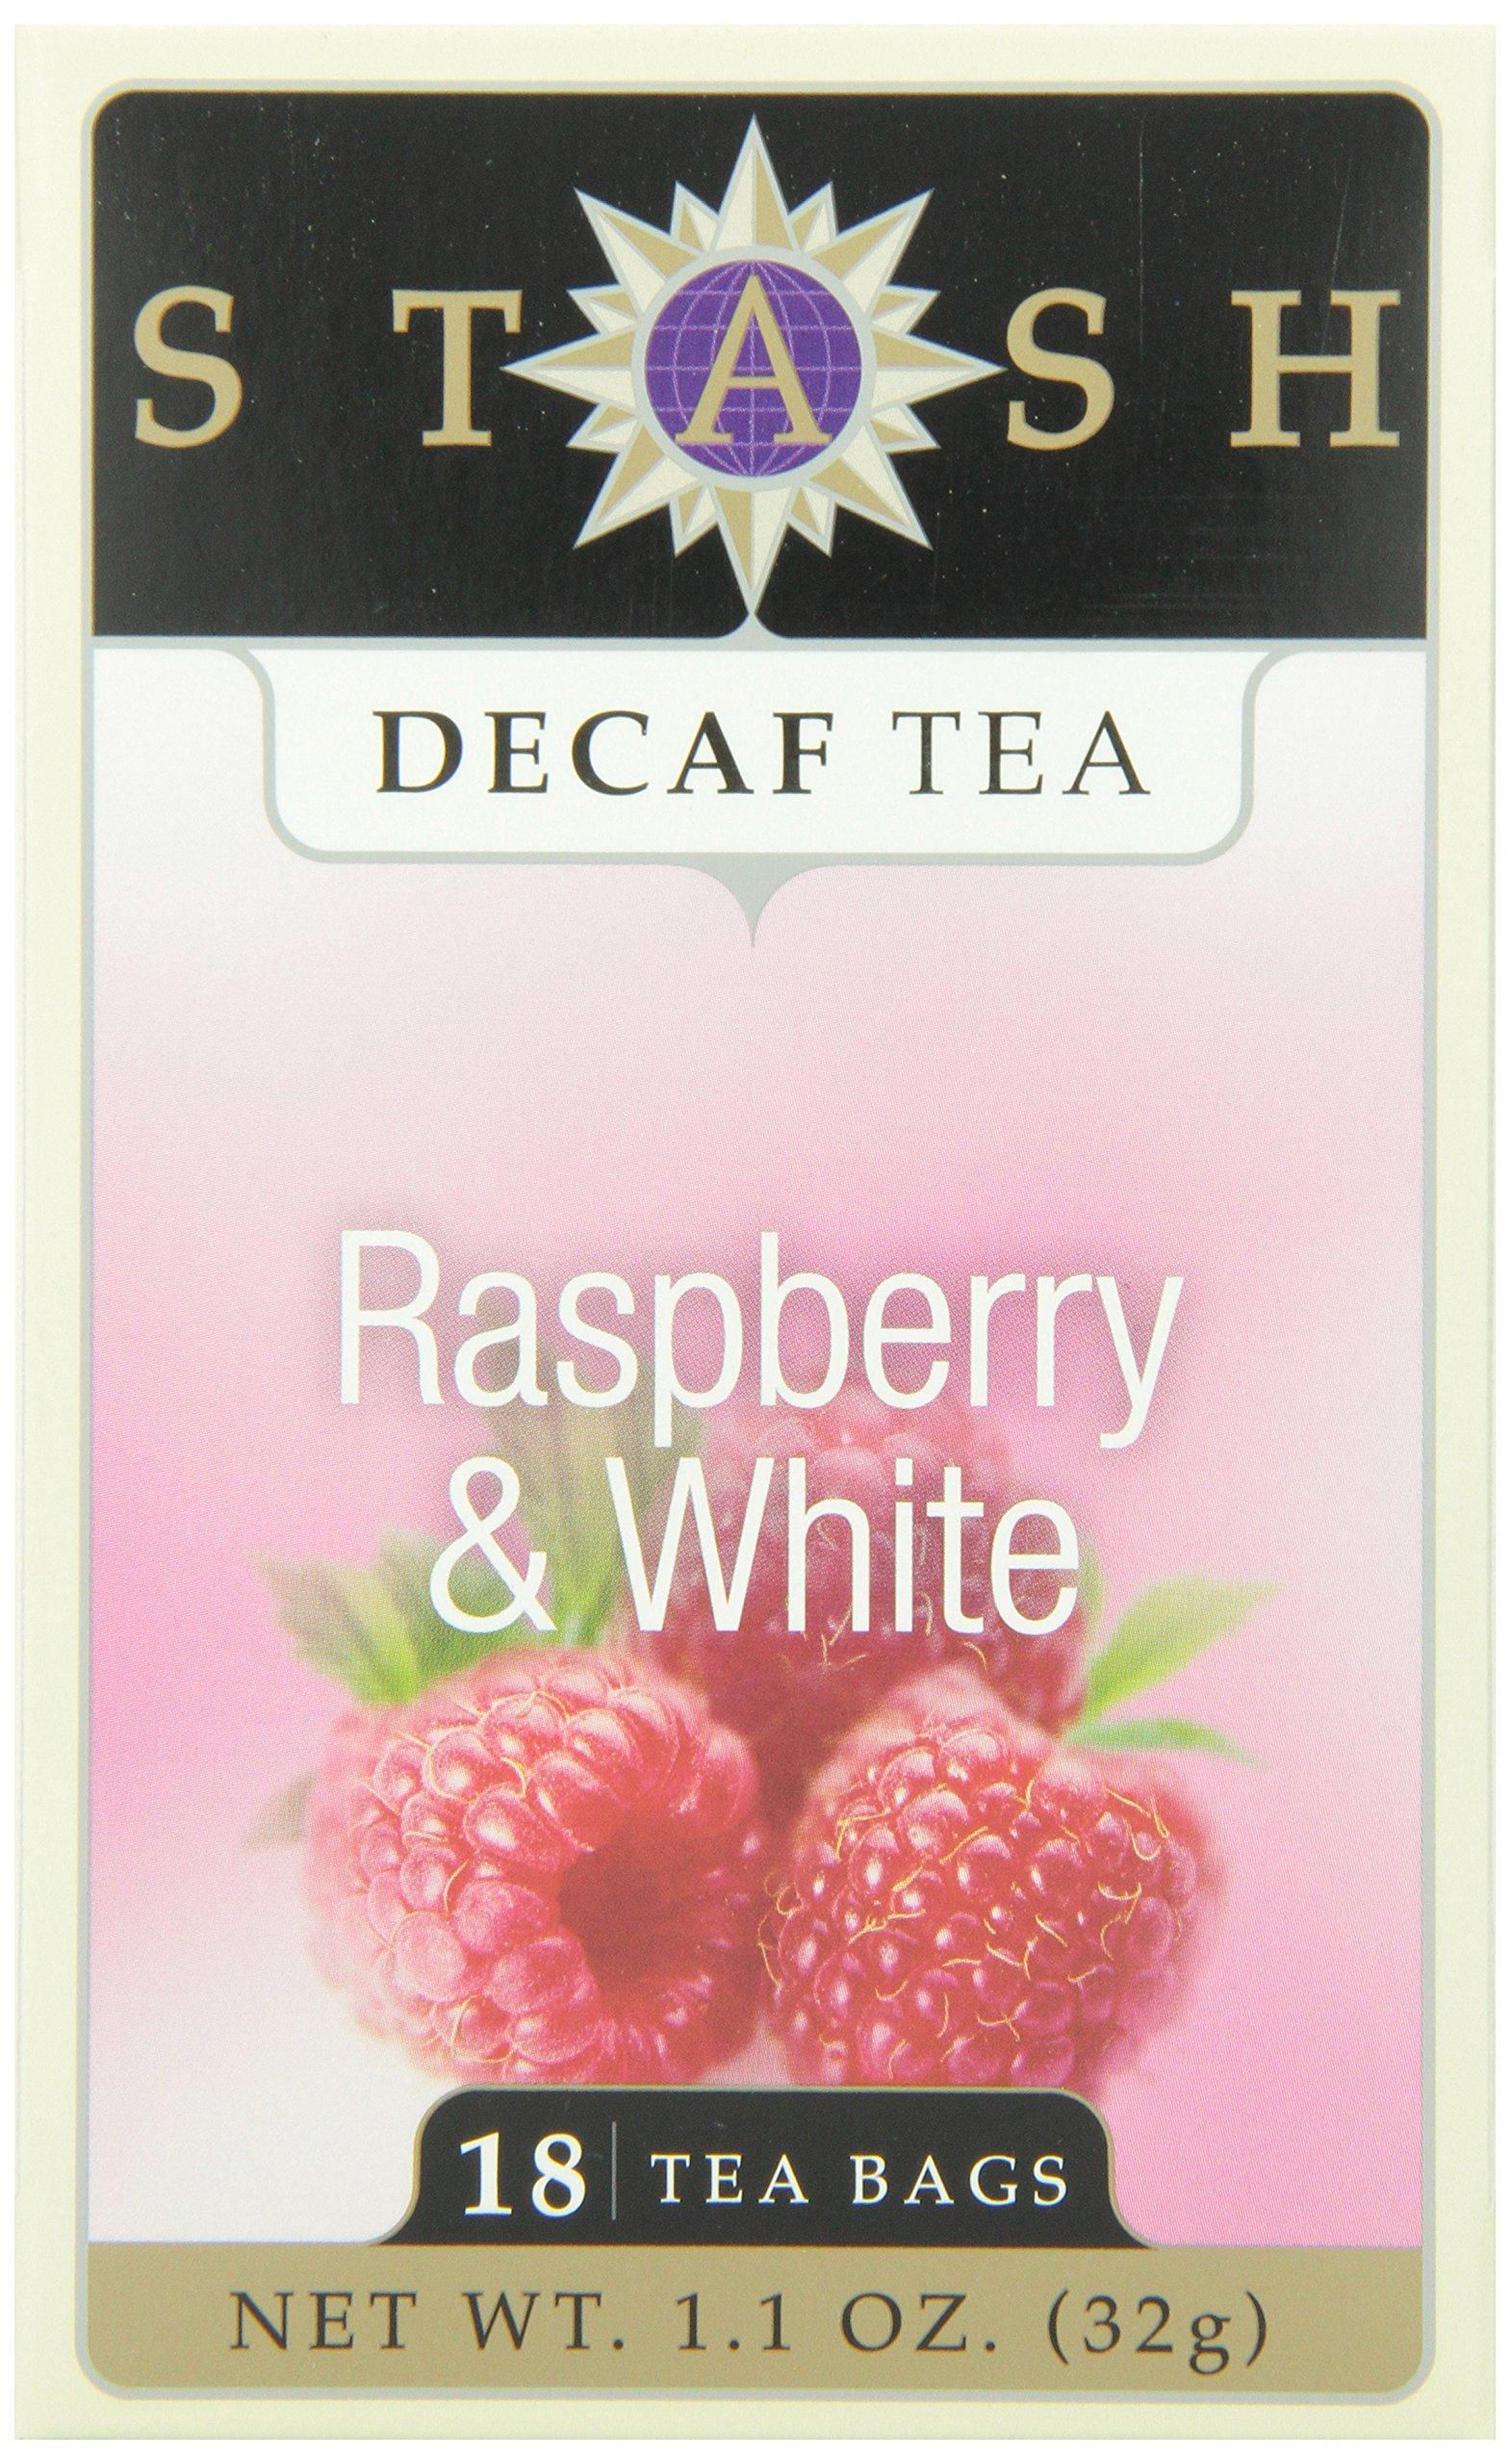 Stash Tea Decaf Raspberry & White Tea, 18 Count Tea Bags in Foil (Pack of 6)